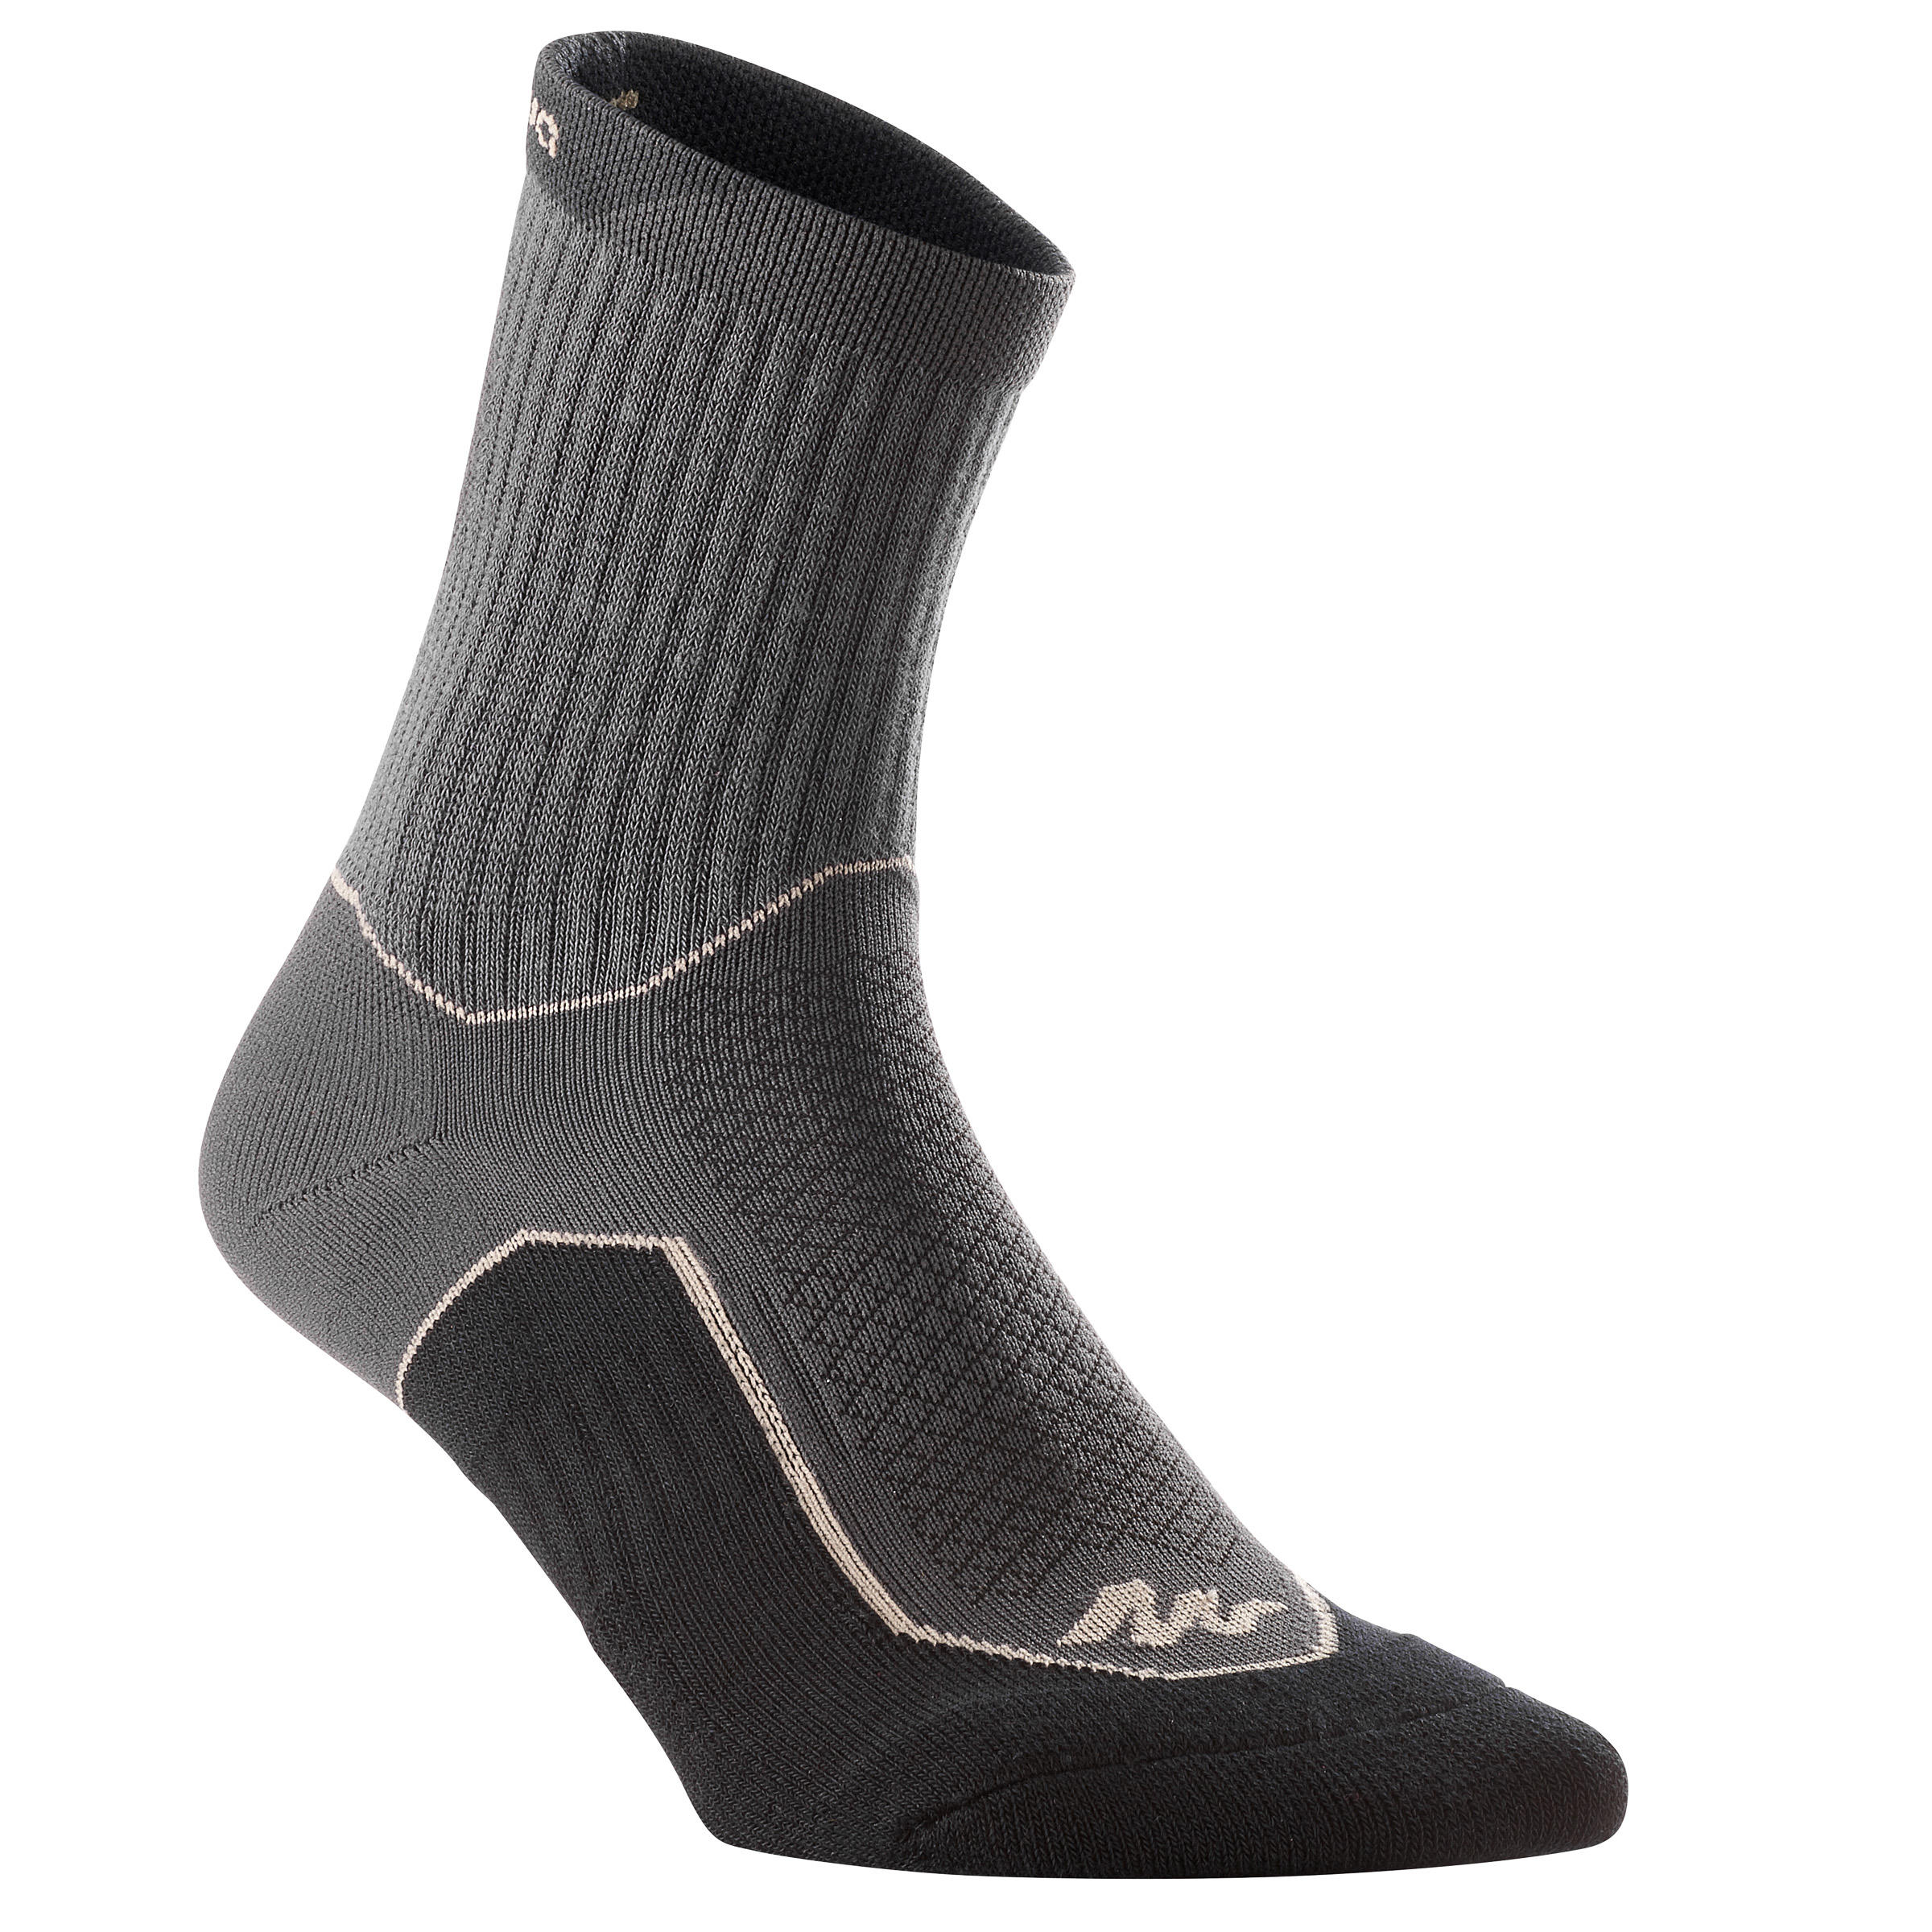 NH500 High country walking socks - black x 2 pairs